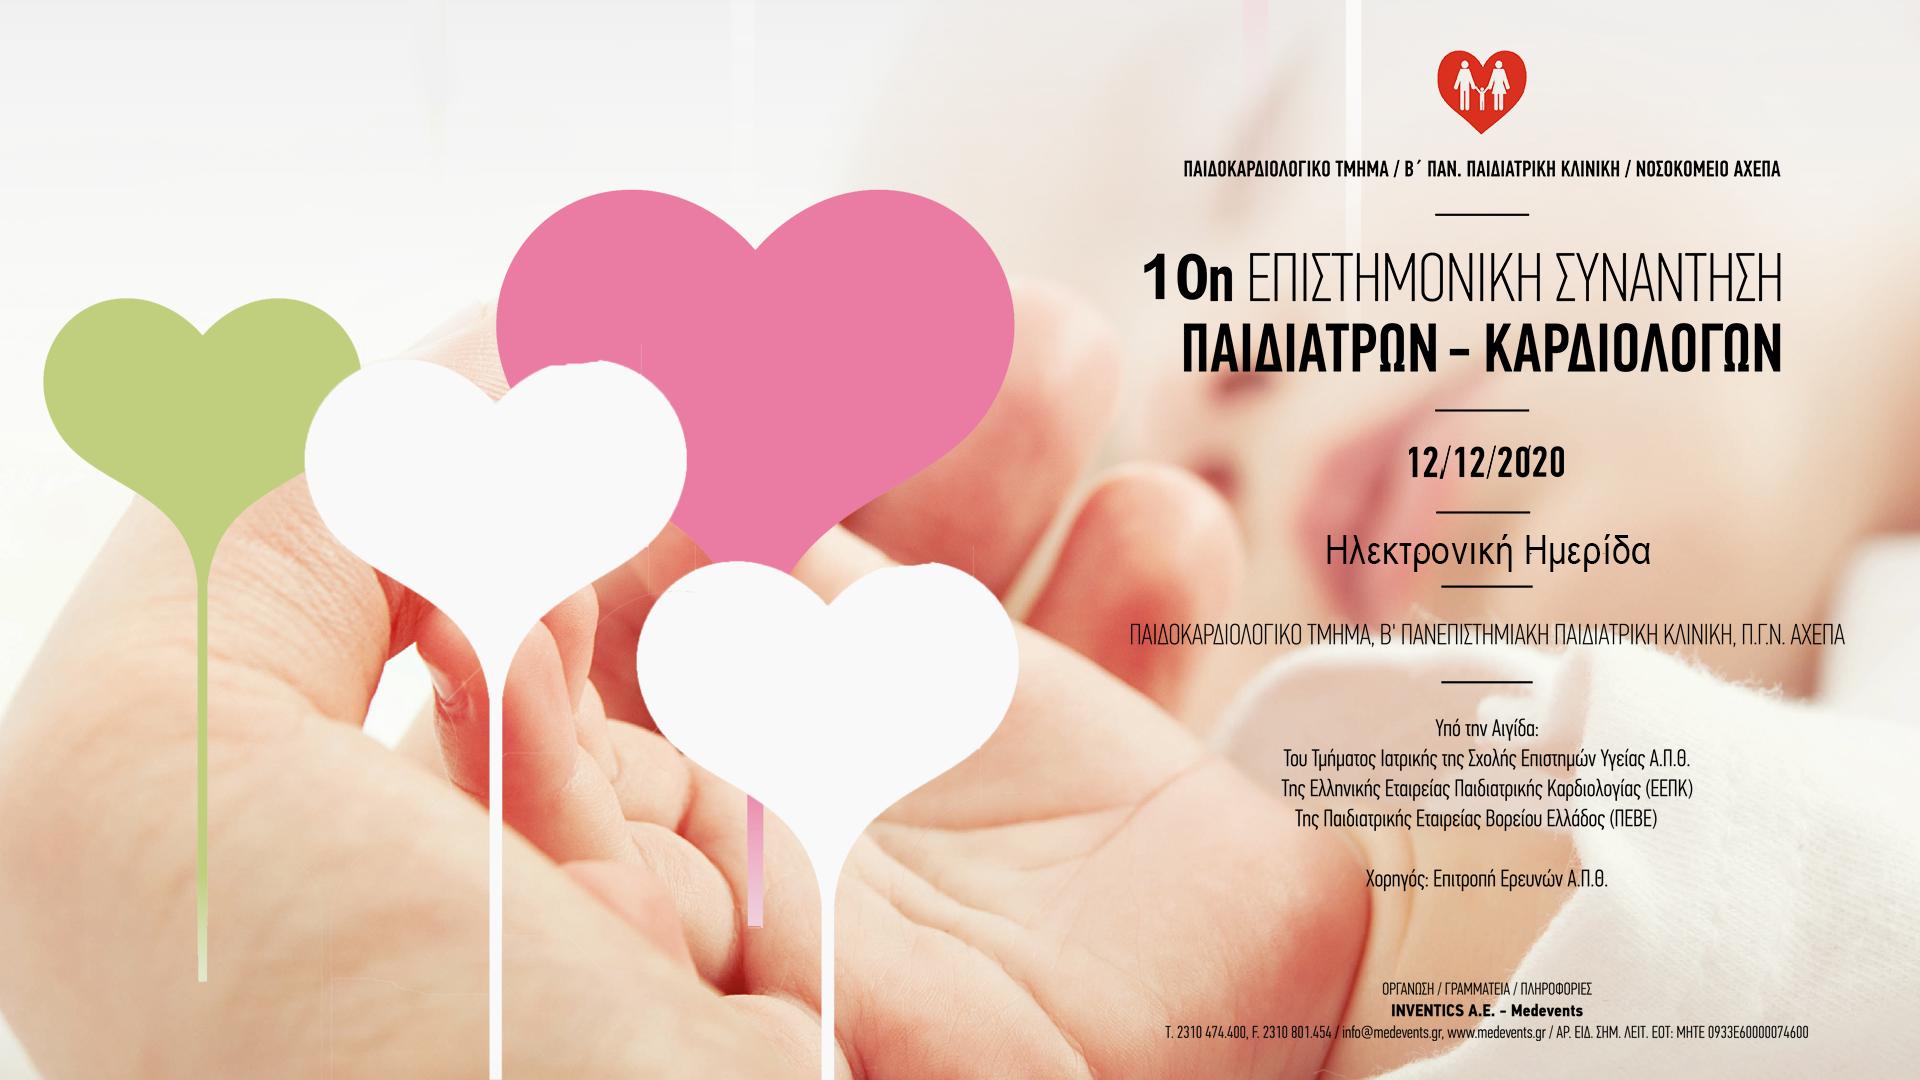 10th Scientific Meeting Pediatricians / Cardiologists